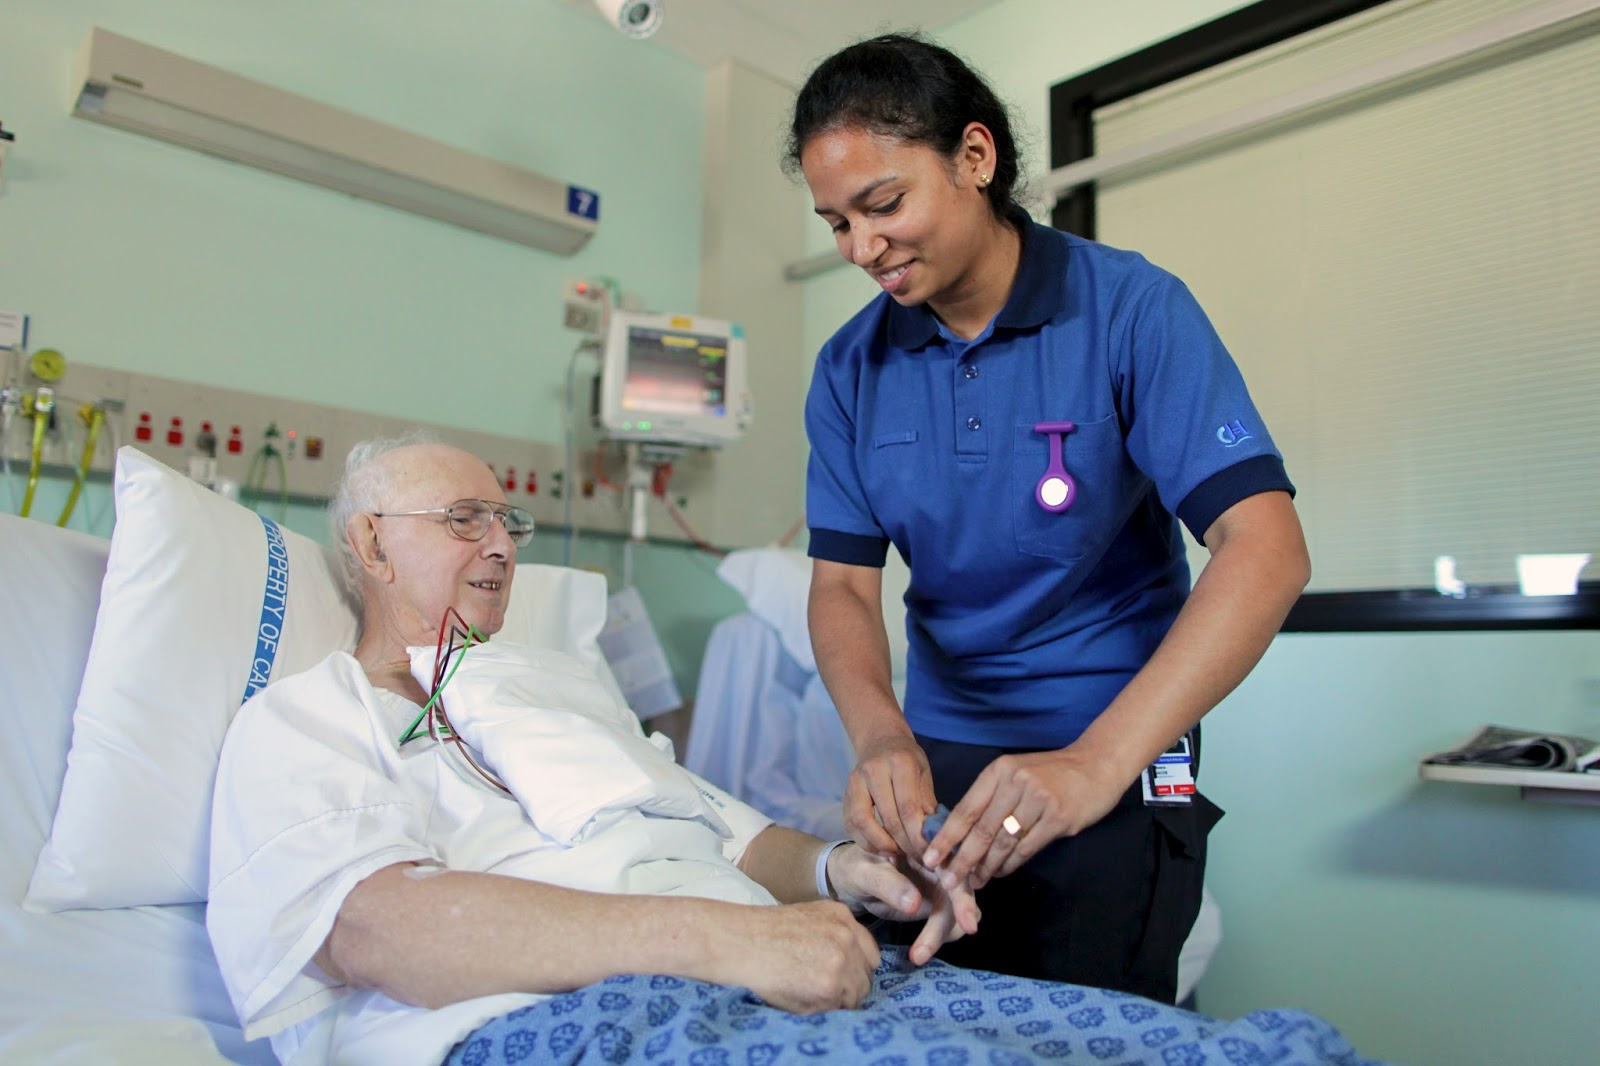 Nurse Jerks Off Patient